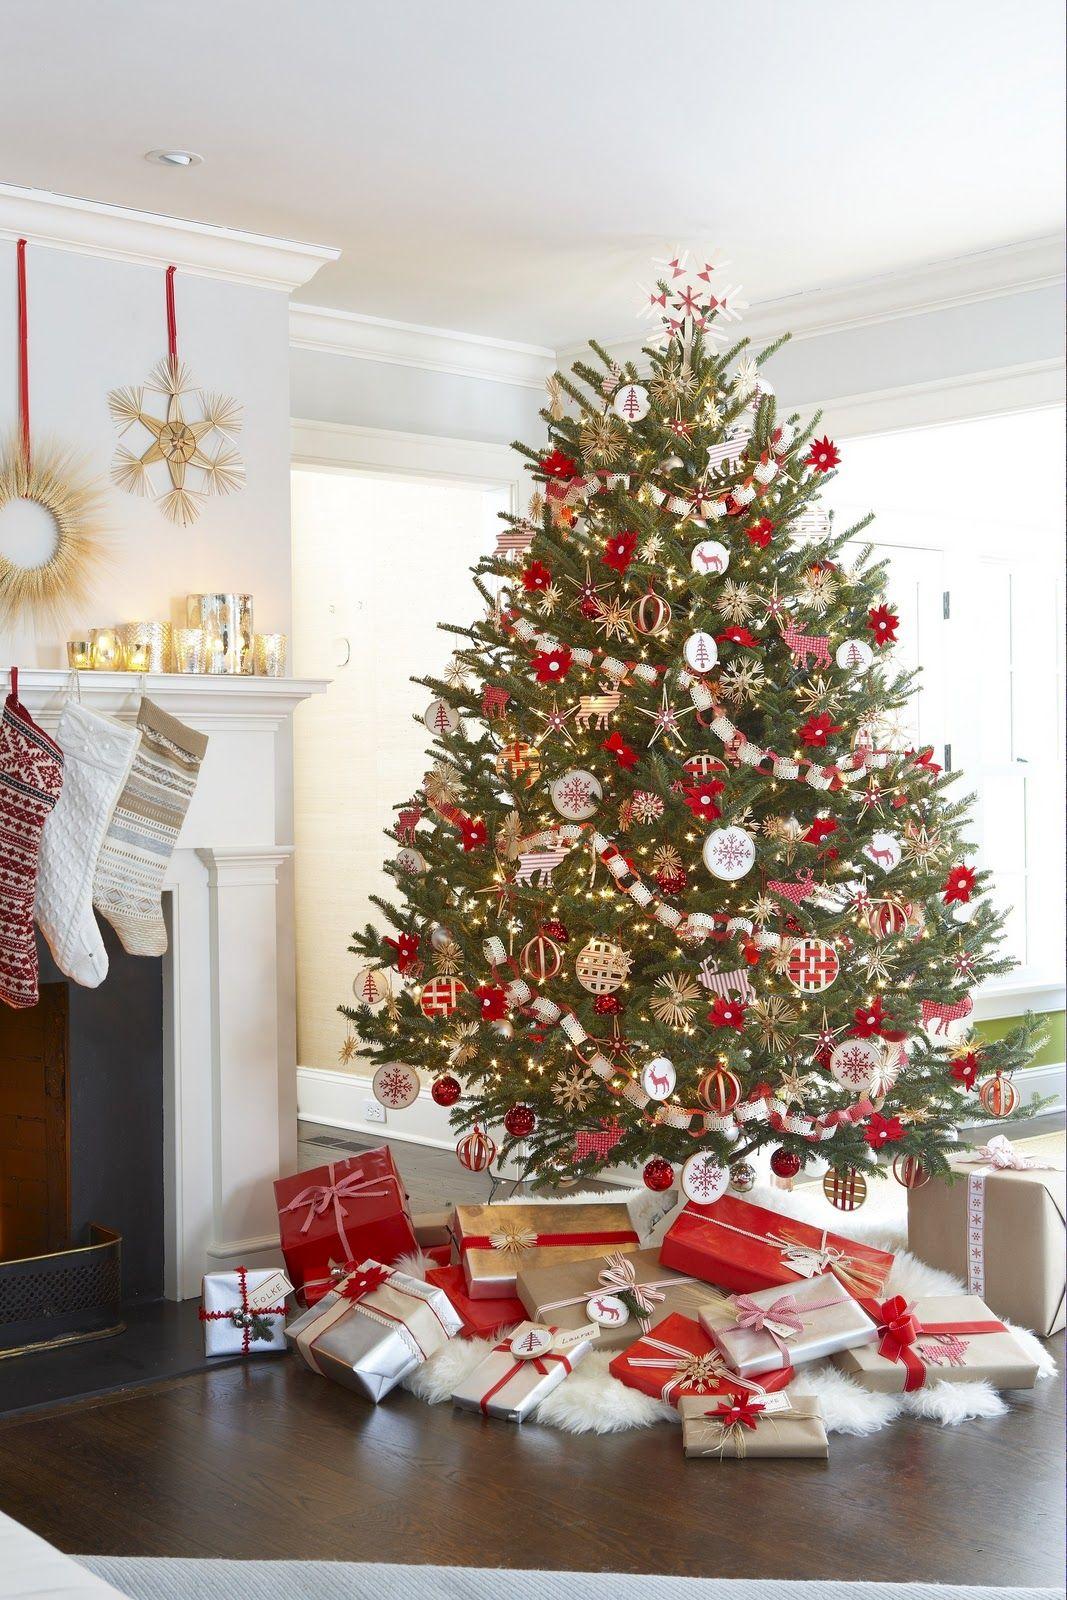 designing my swedish christmas christmas ideas scandinavian rh pinterest com sweden christmas tree decorations